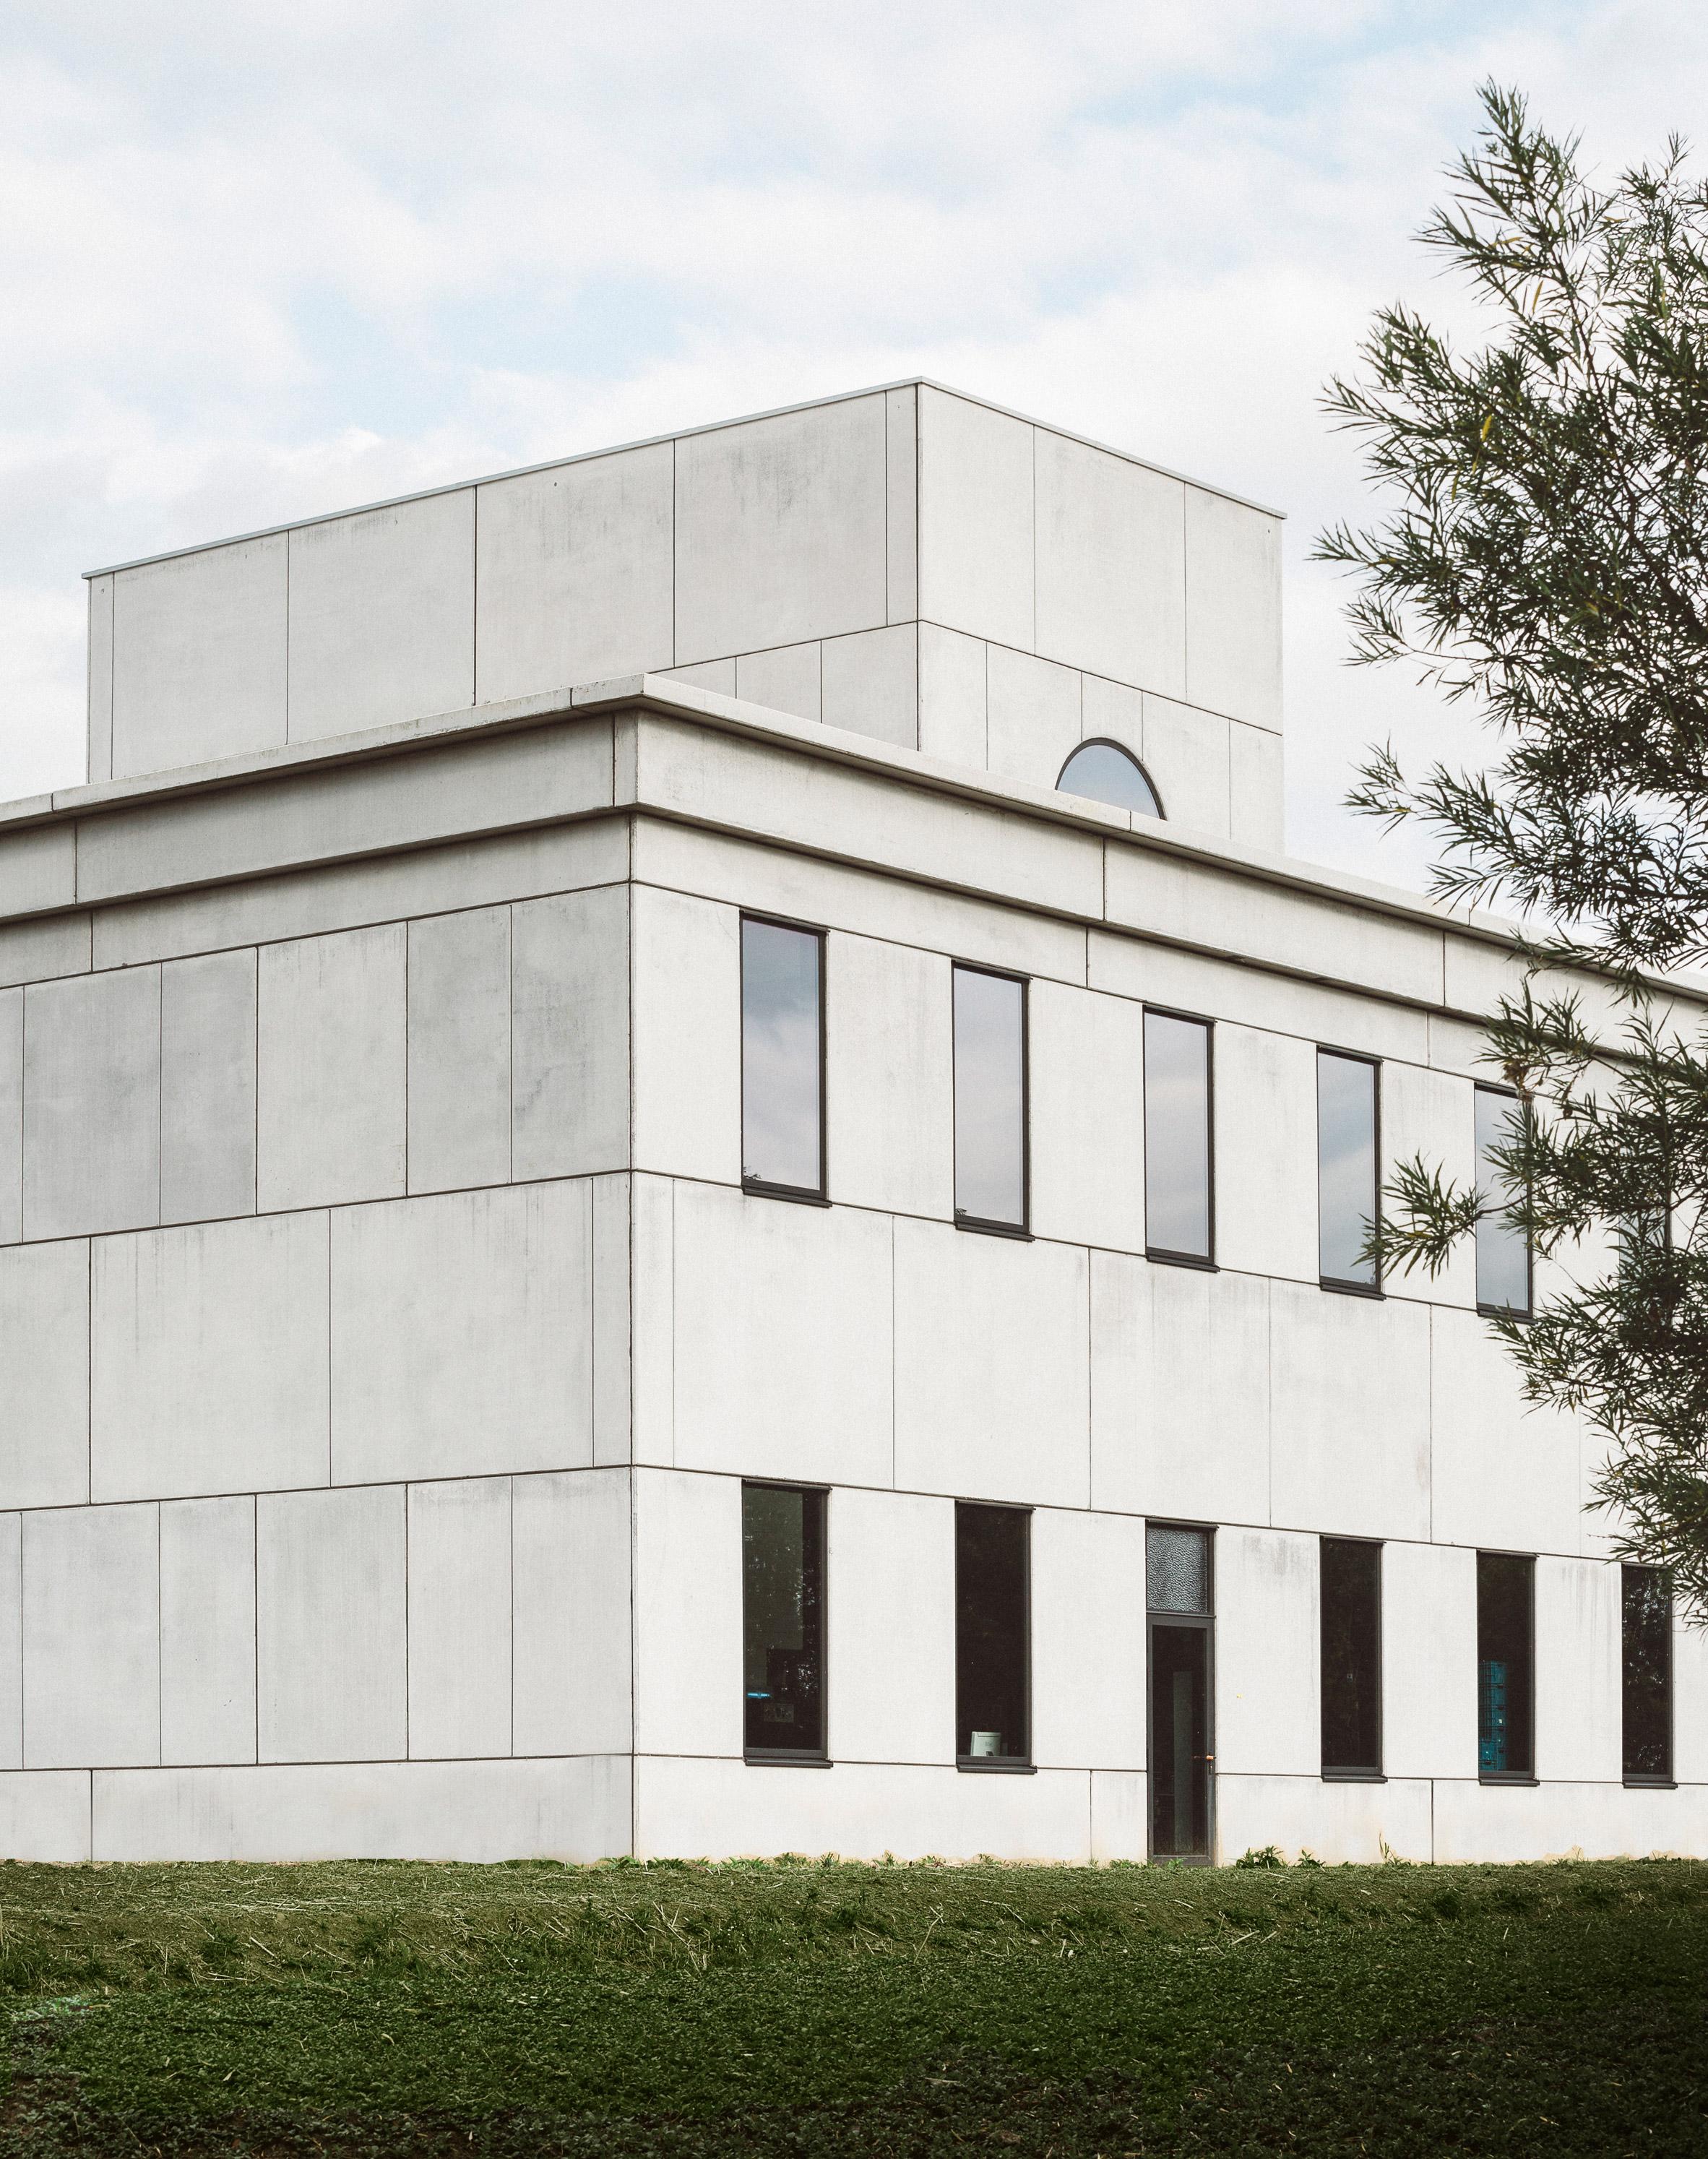 Camp's factory by Dhooge & Meganck in Belgium